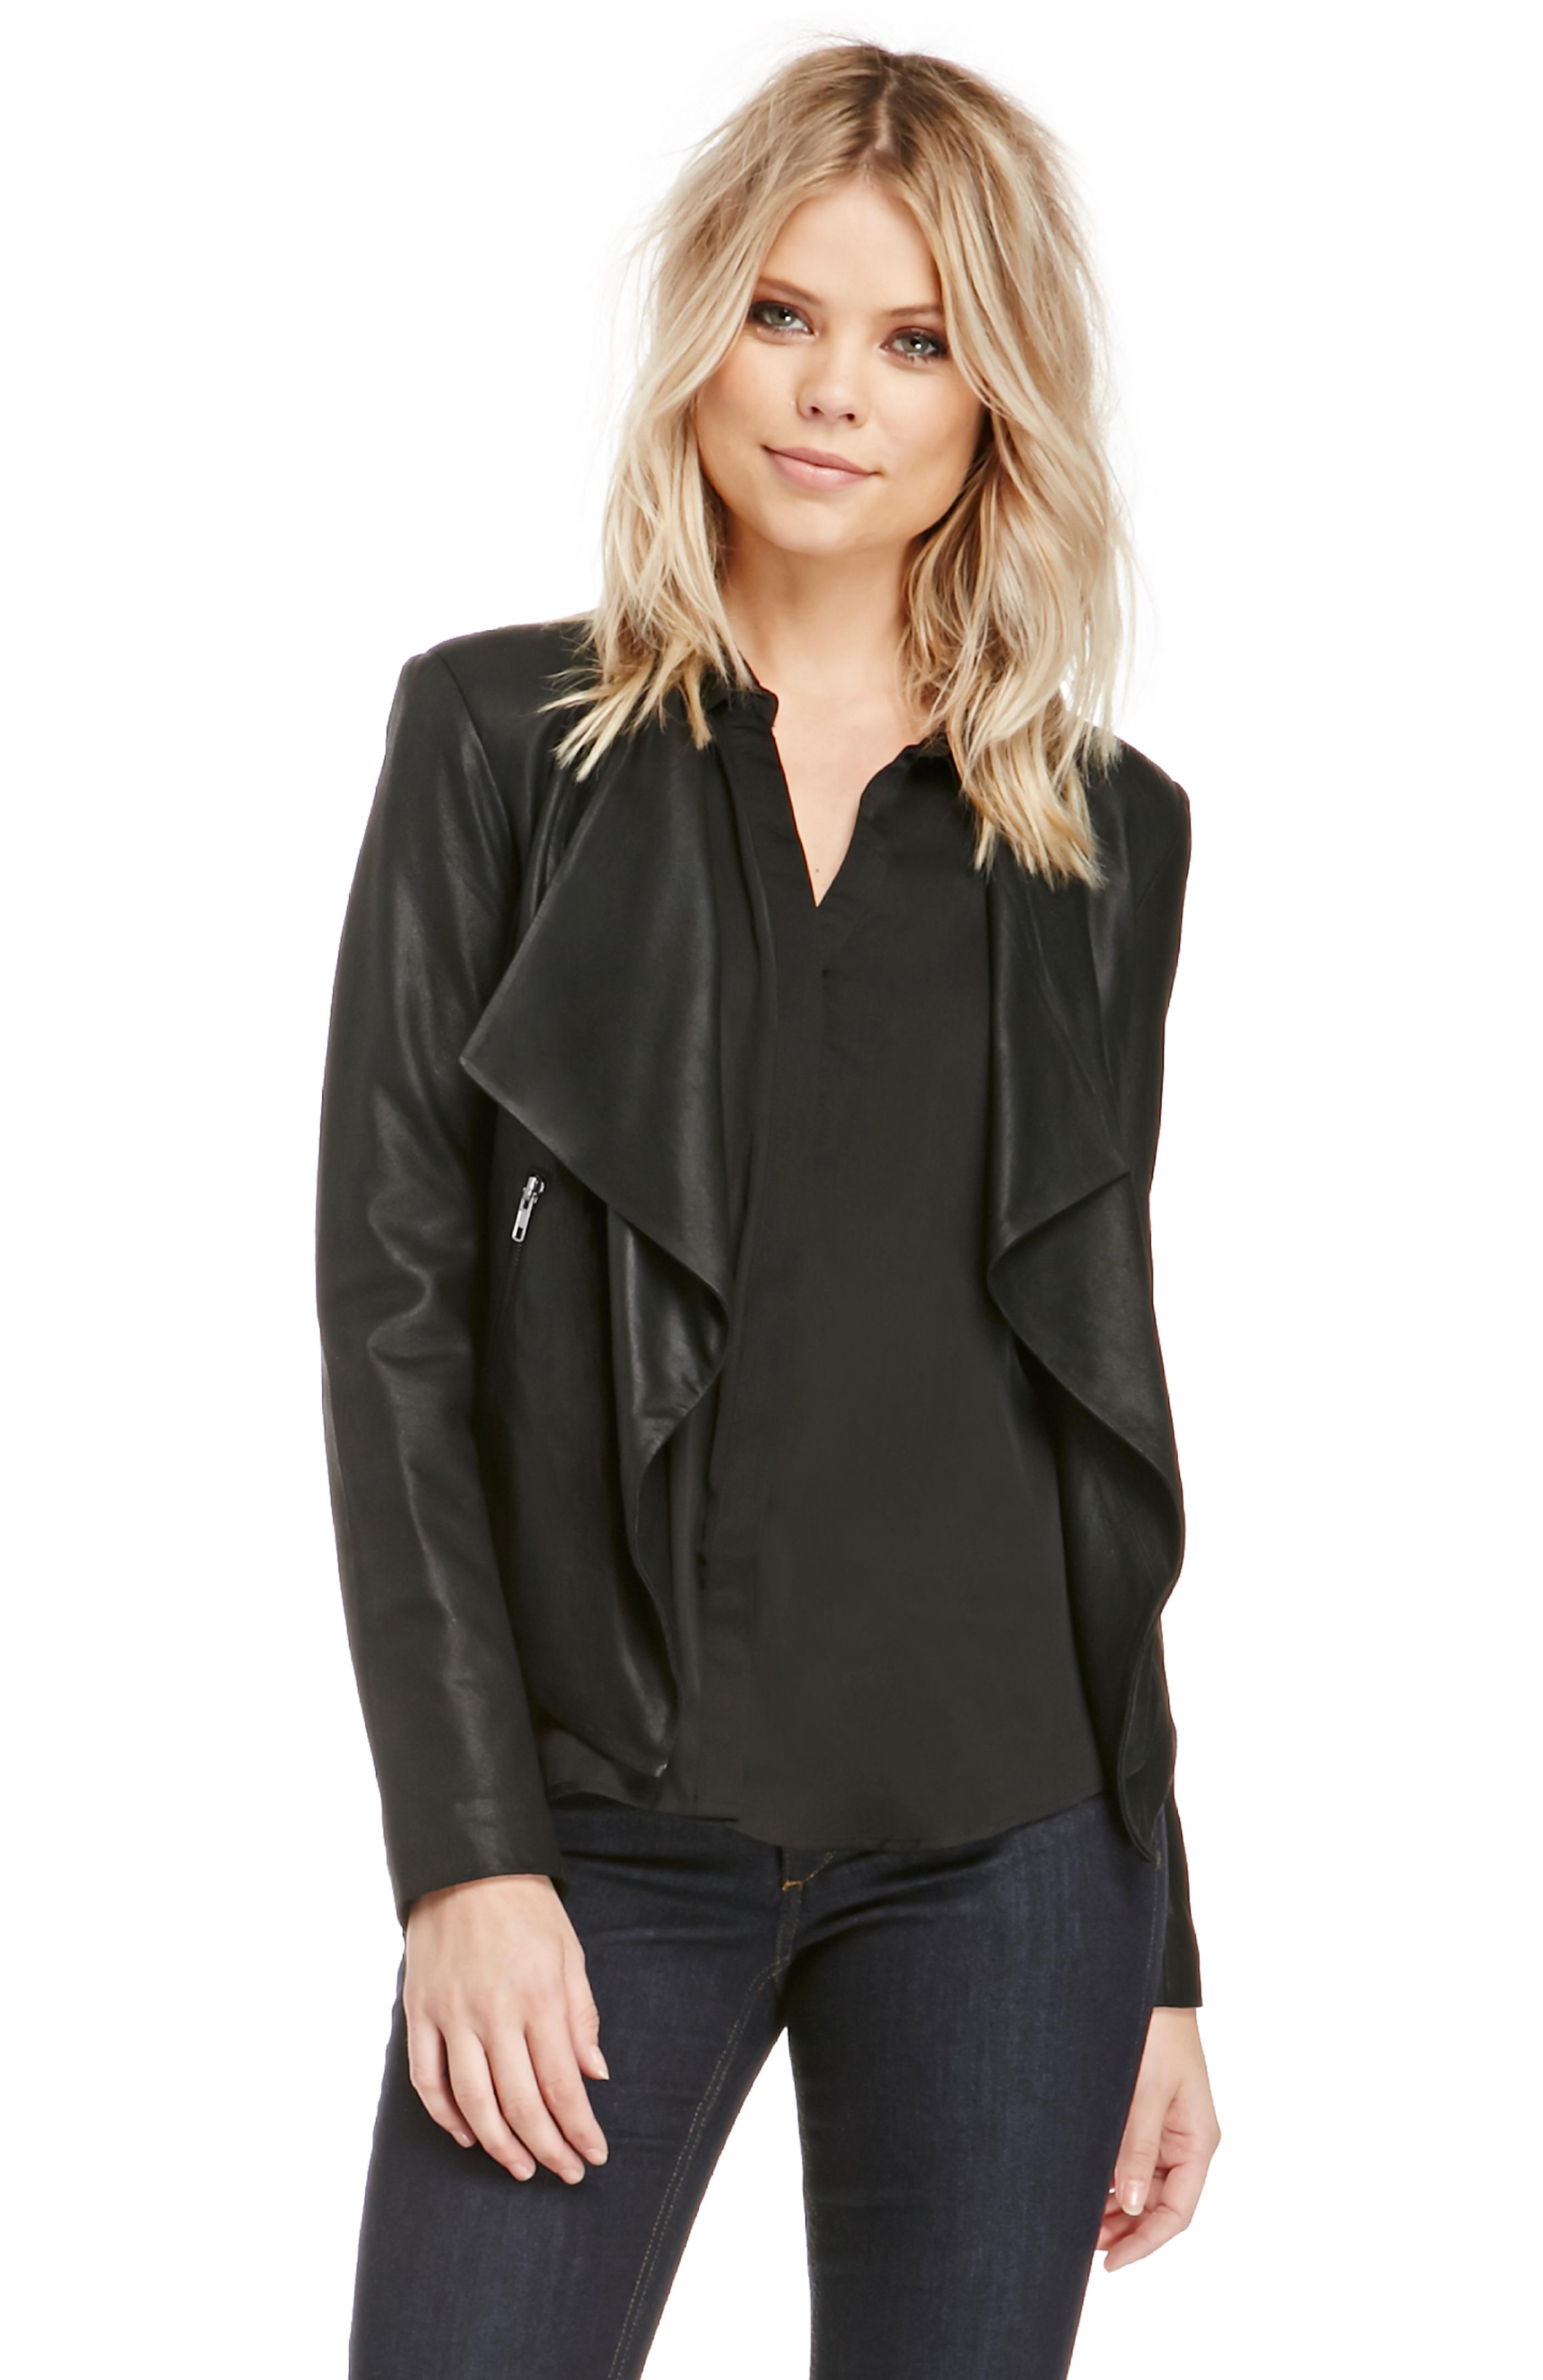 DailyLook: BB Dakota Tyne Leather Jacket in Black M - L